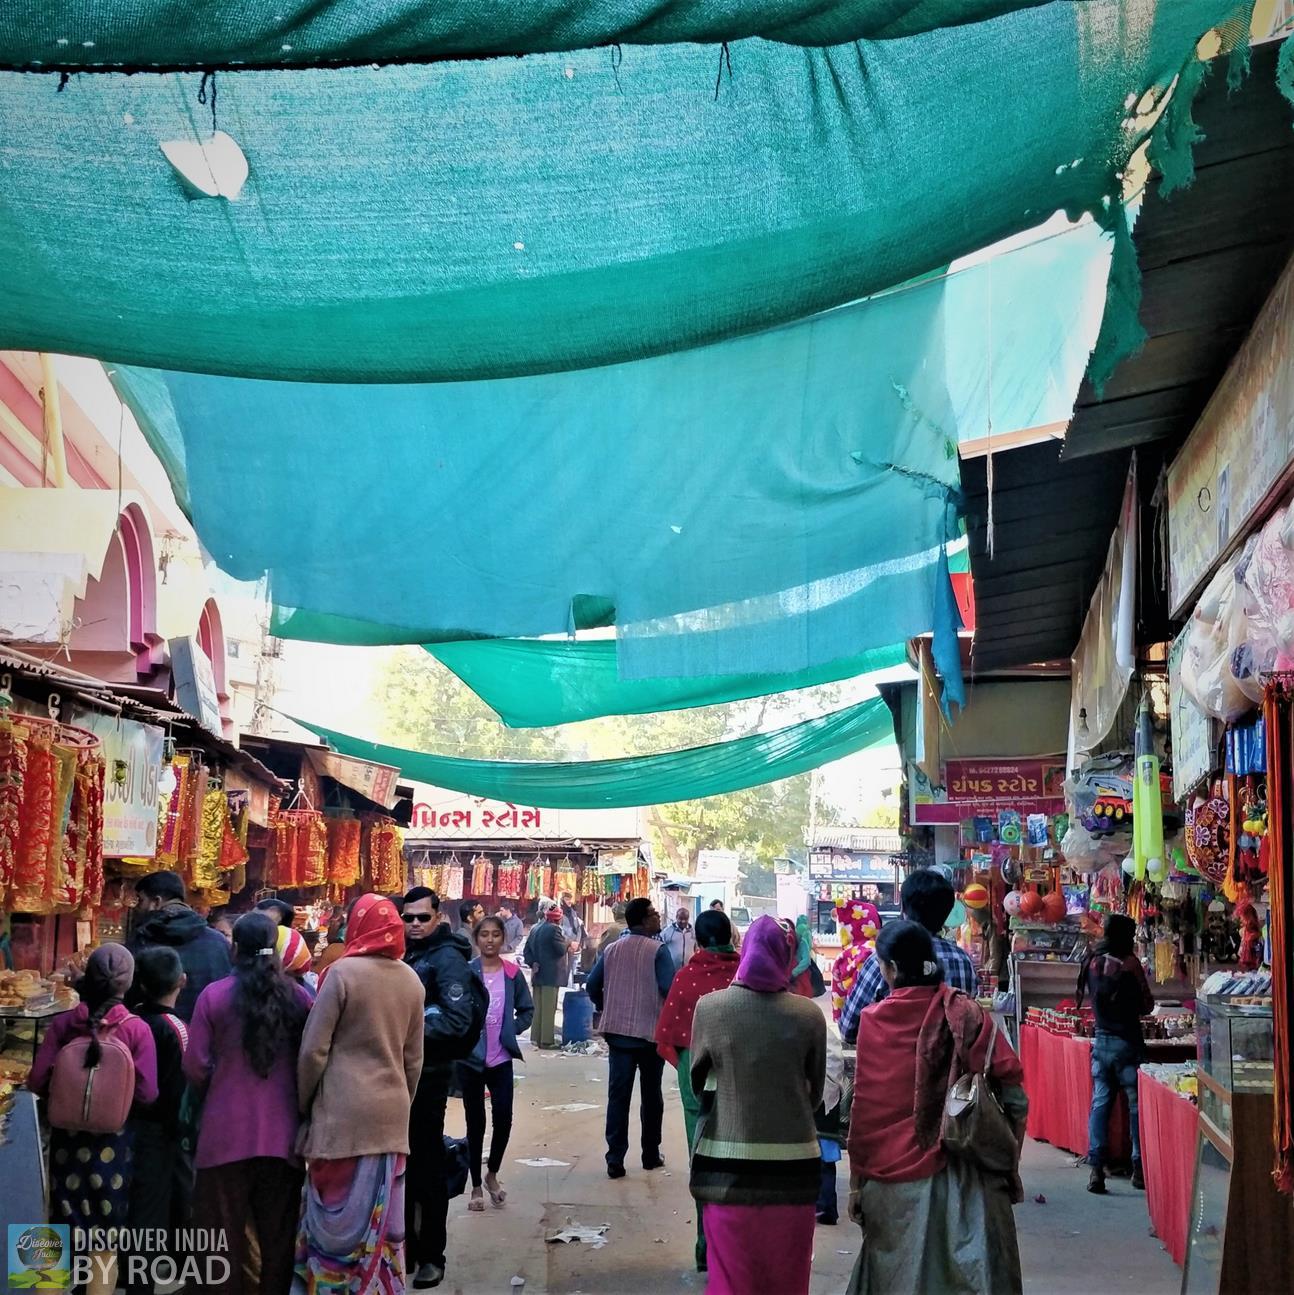 Narrow street going towards Mata na madh temple